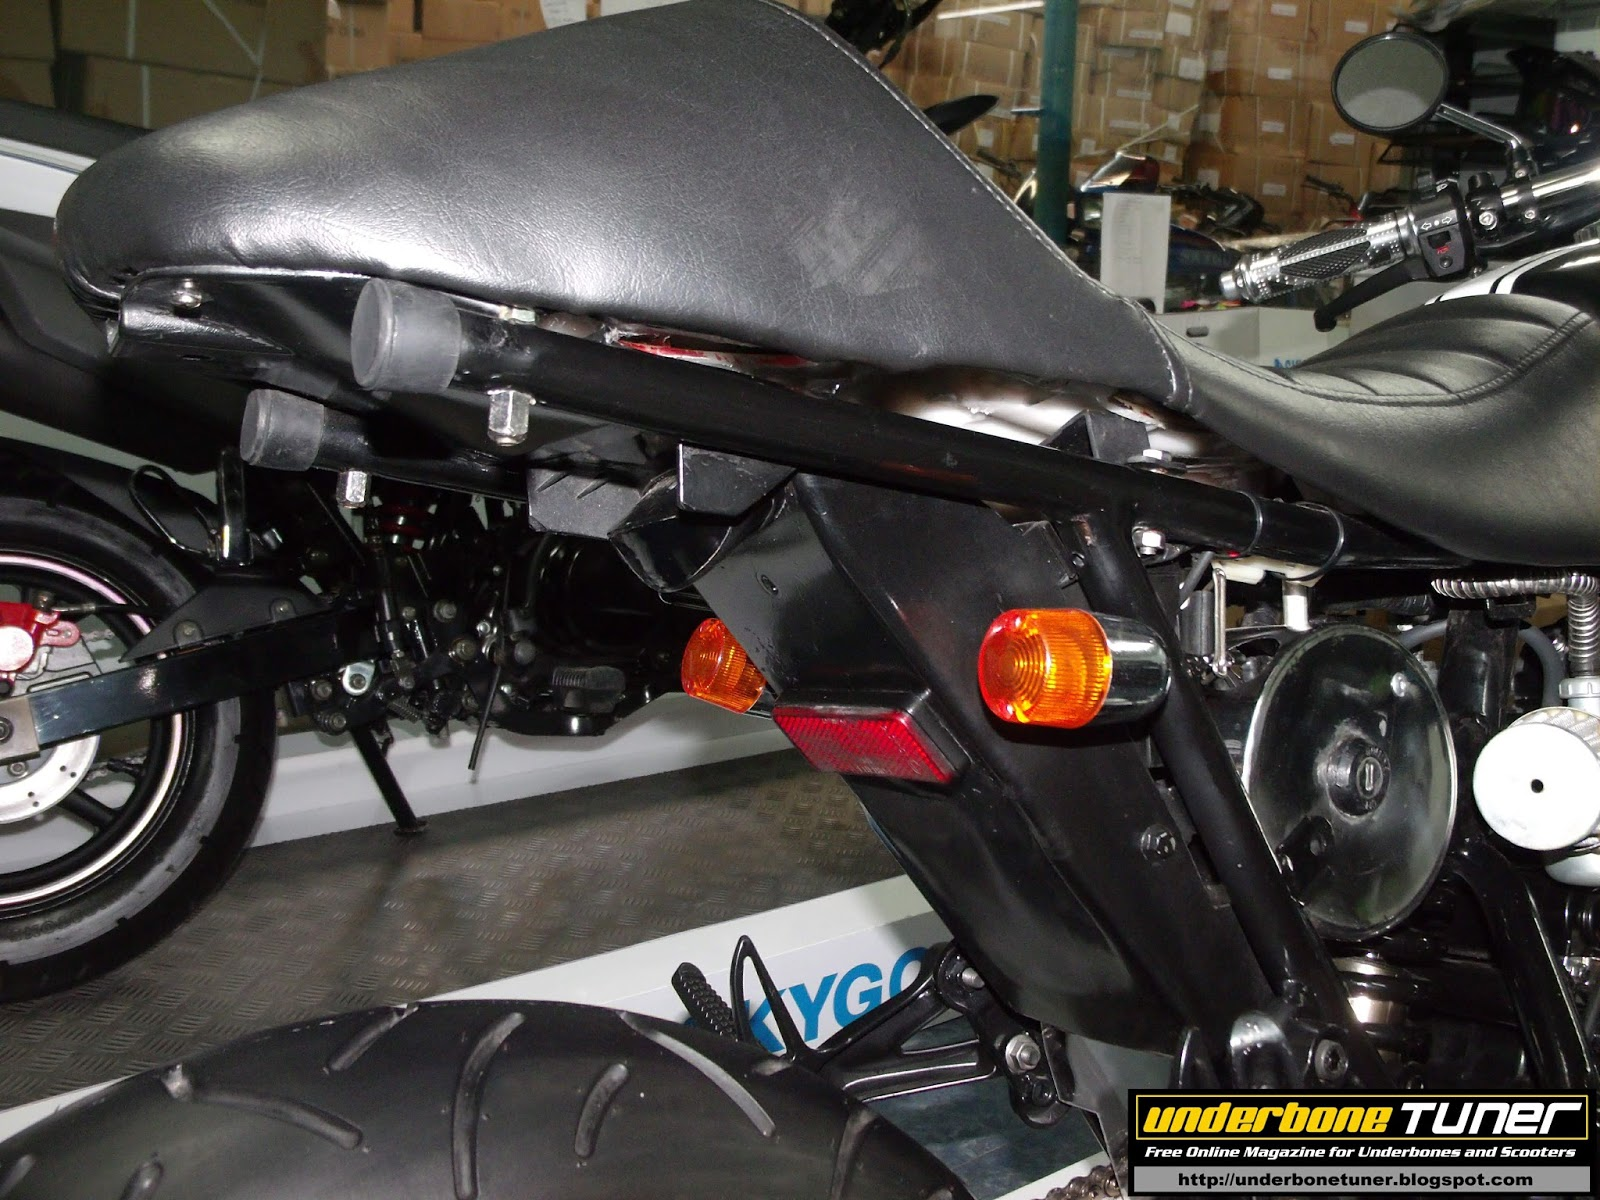 underbone tuner modified bikes  skygo pony cafe racer